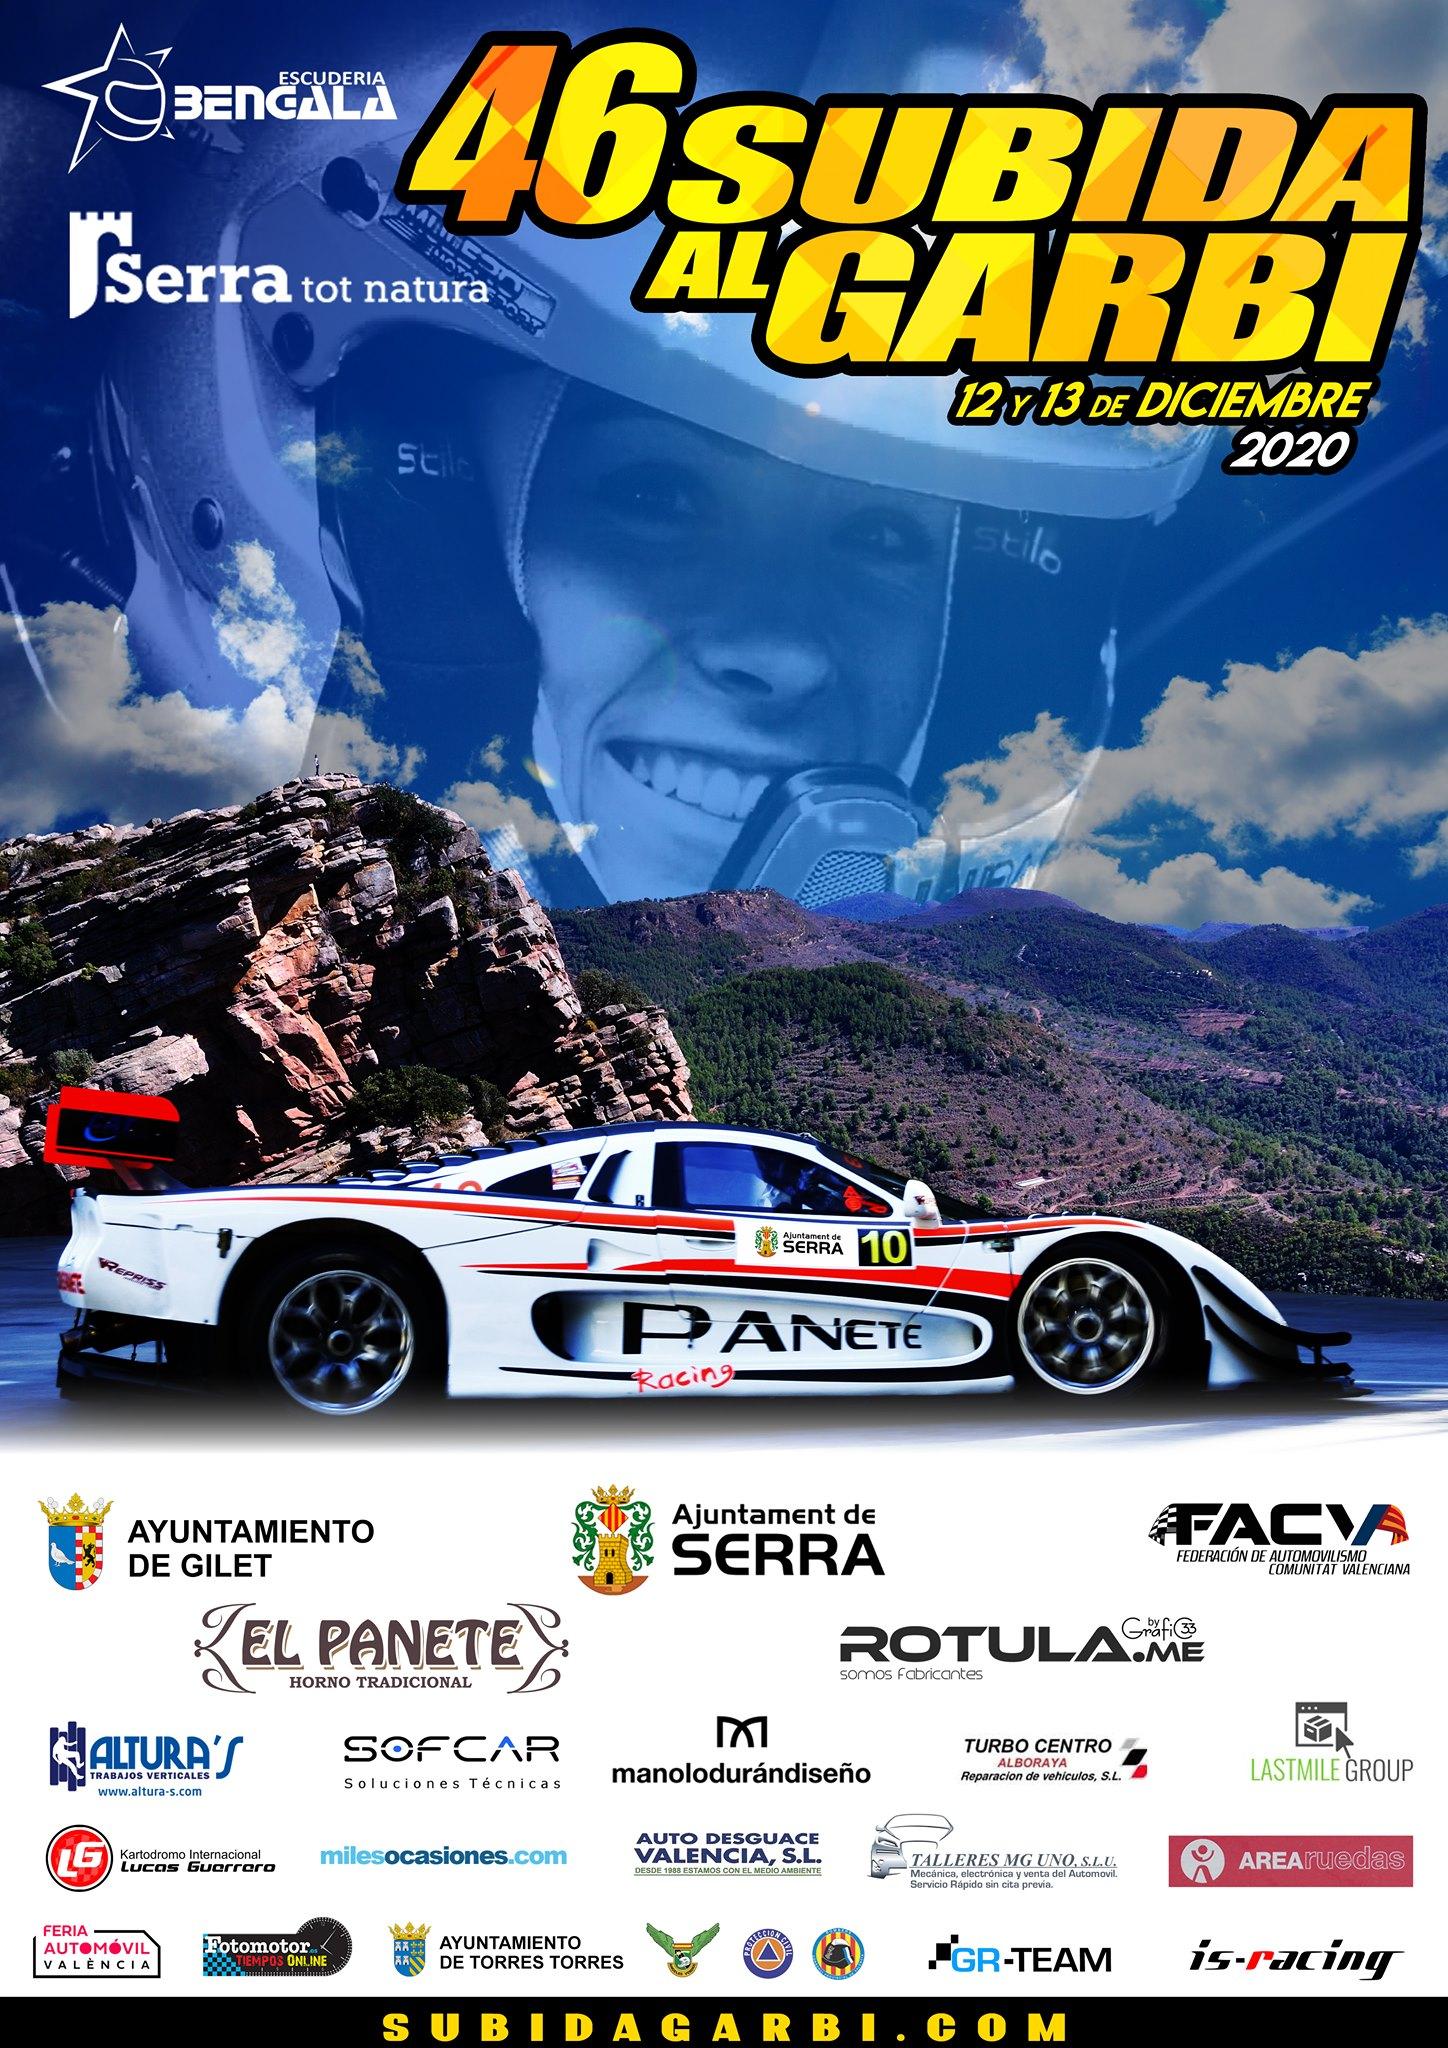 Campeonatos de Montaña Nacionales e Internacionales (FIA European Hillclimb, Berg Cup, BHC, CIVM, CFM...) - Página 39 Cartel-inscripcion